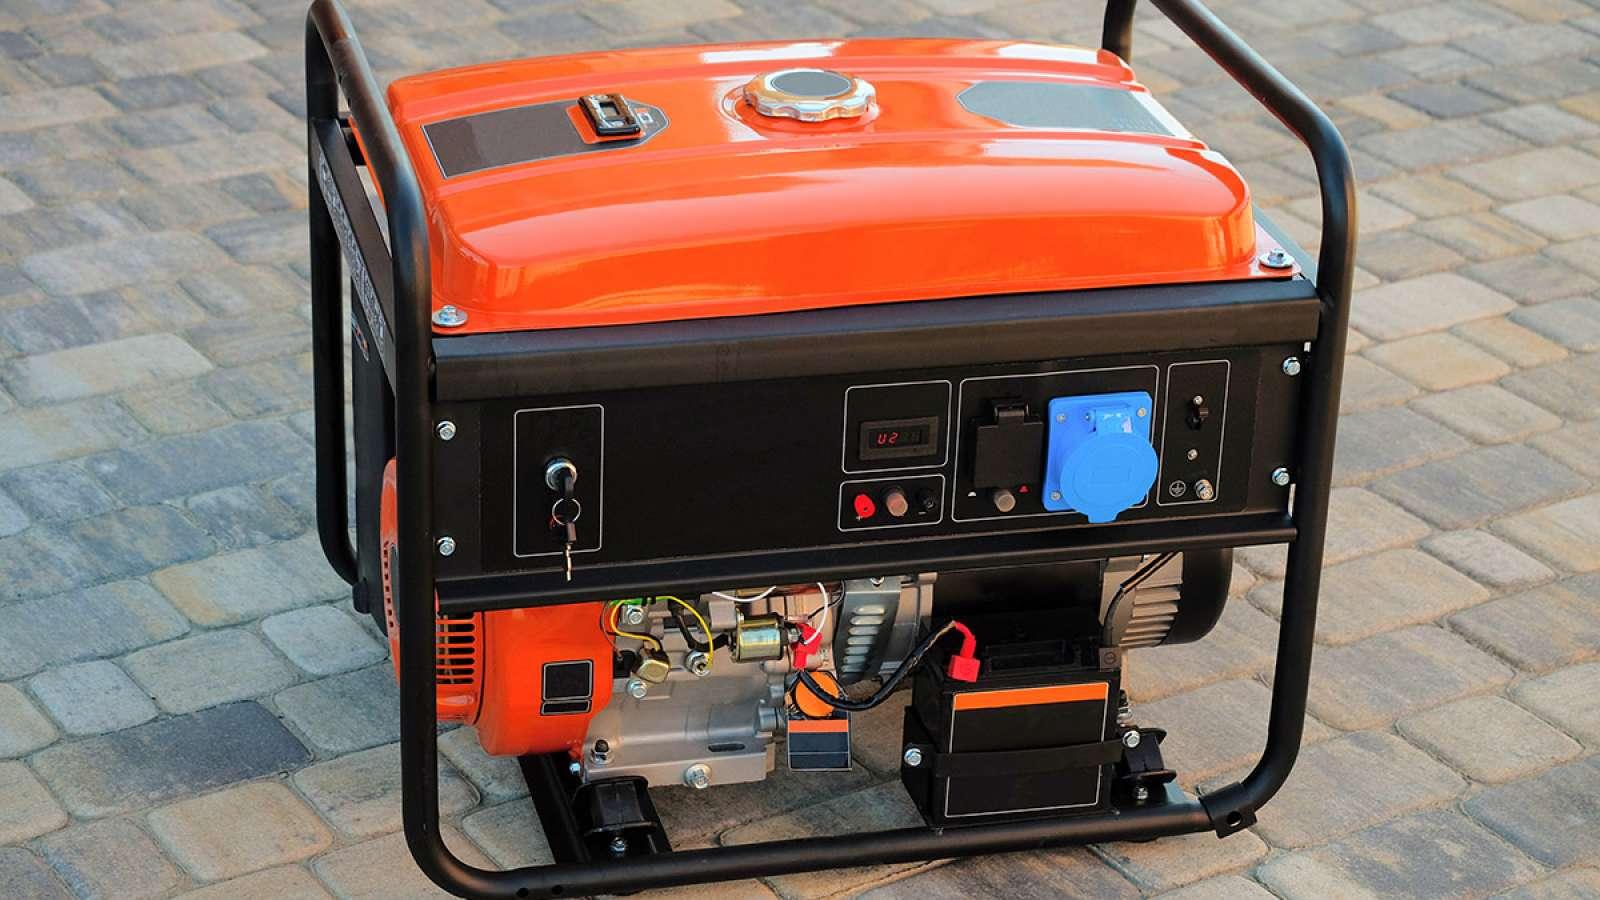 portable generator on a brick patio